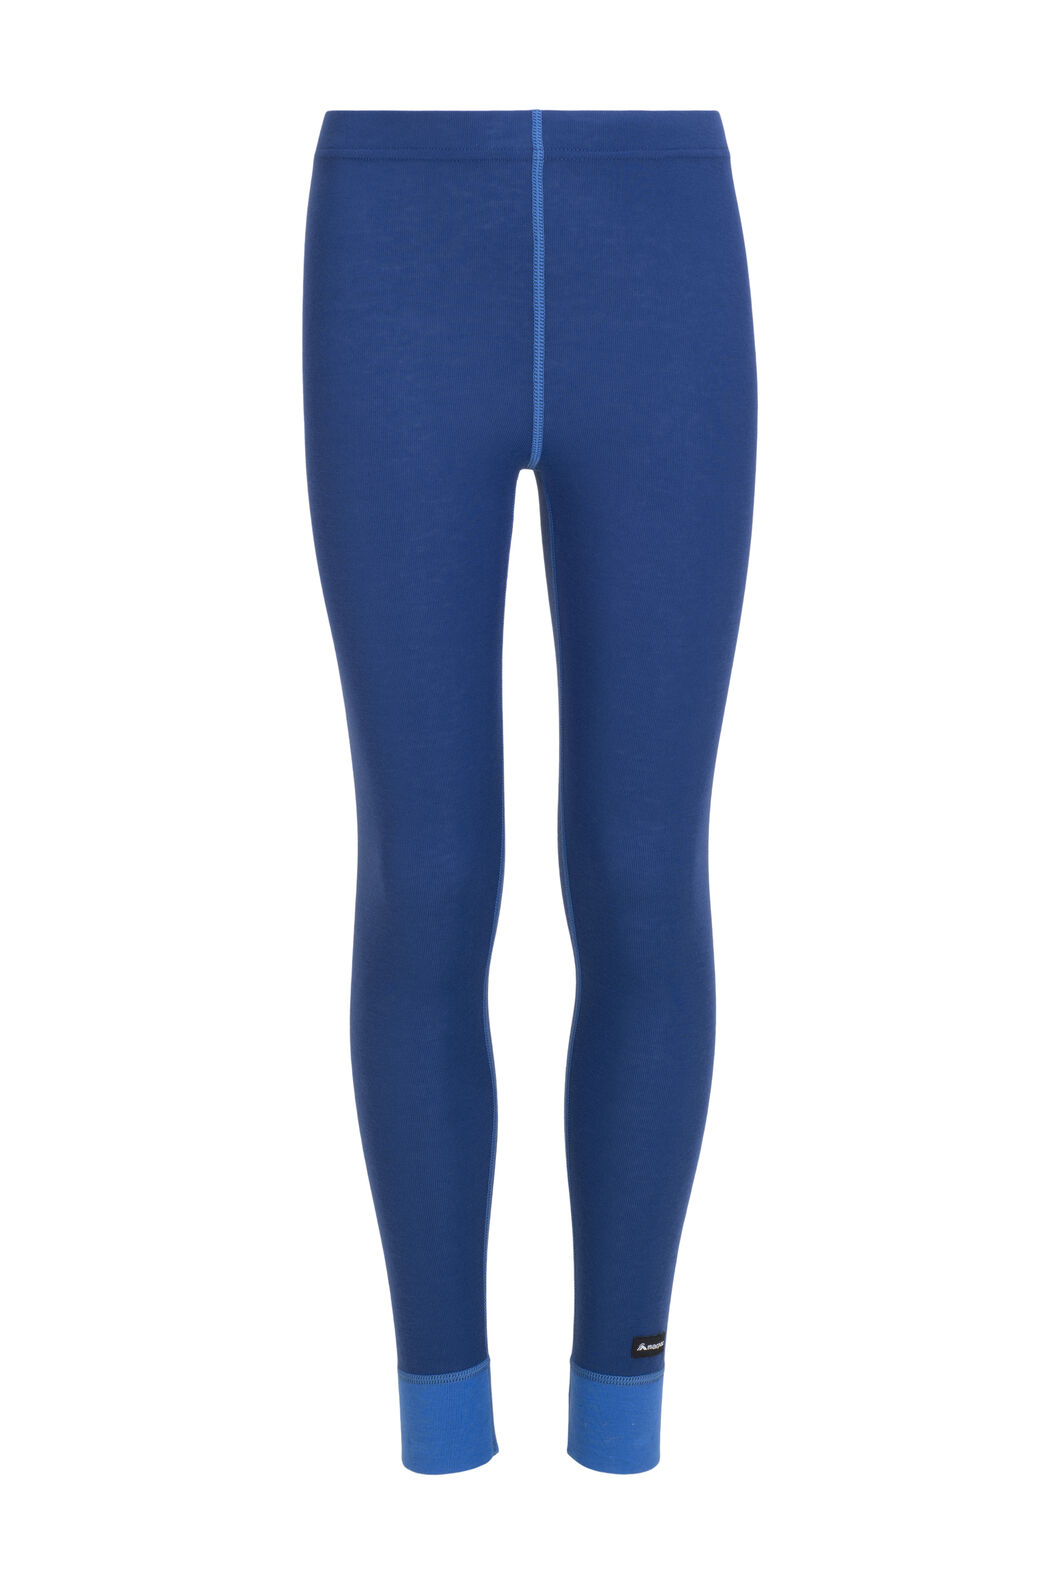 Macpac Geothermal Pants — Kids' (V2), Sodalite Blue/Strong Blue, hi-res